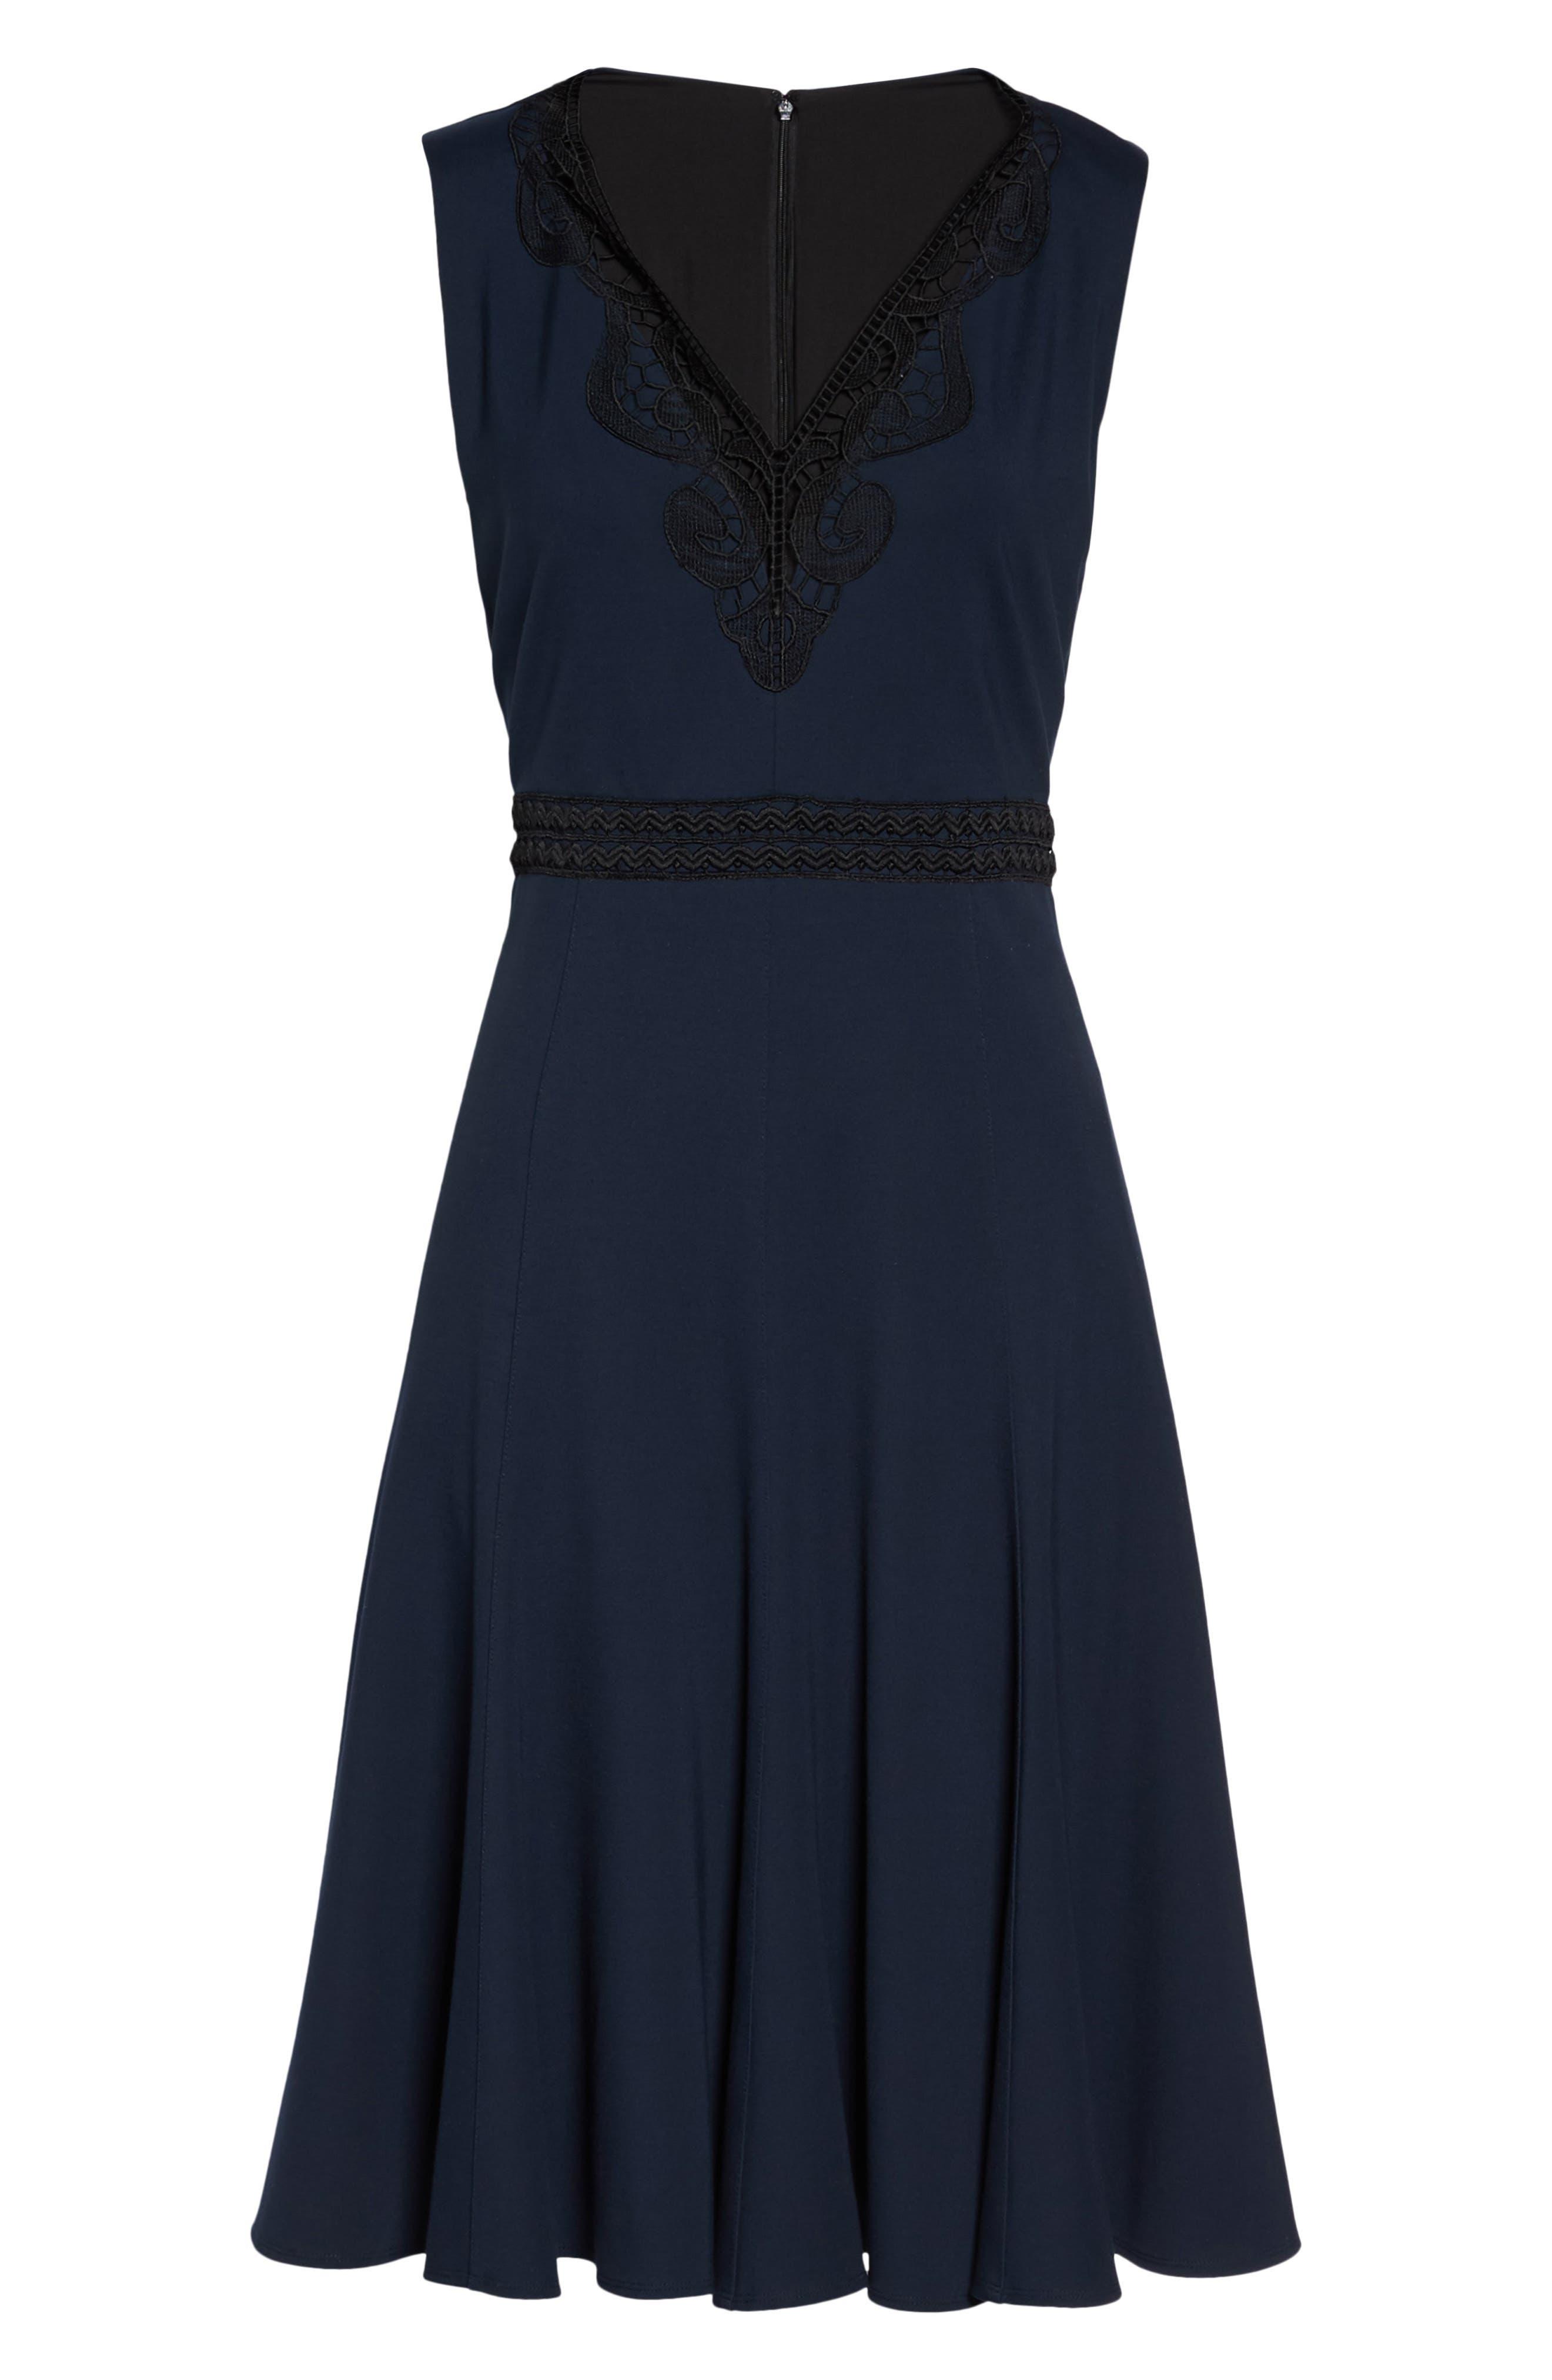 Hazel Lace Trim V-Neck Dress,                             Alternate thumbnail 6, color,                             Midnight Blue/ Black